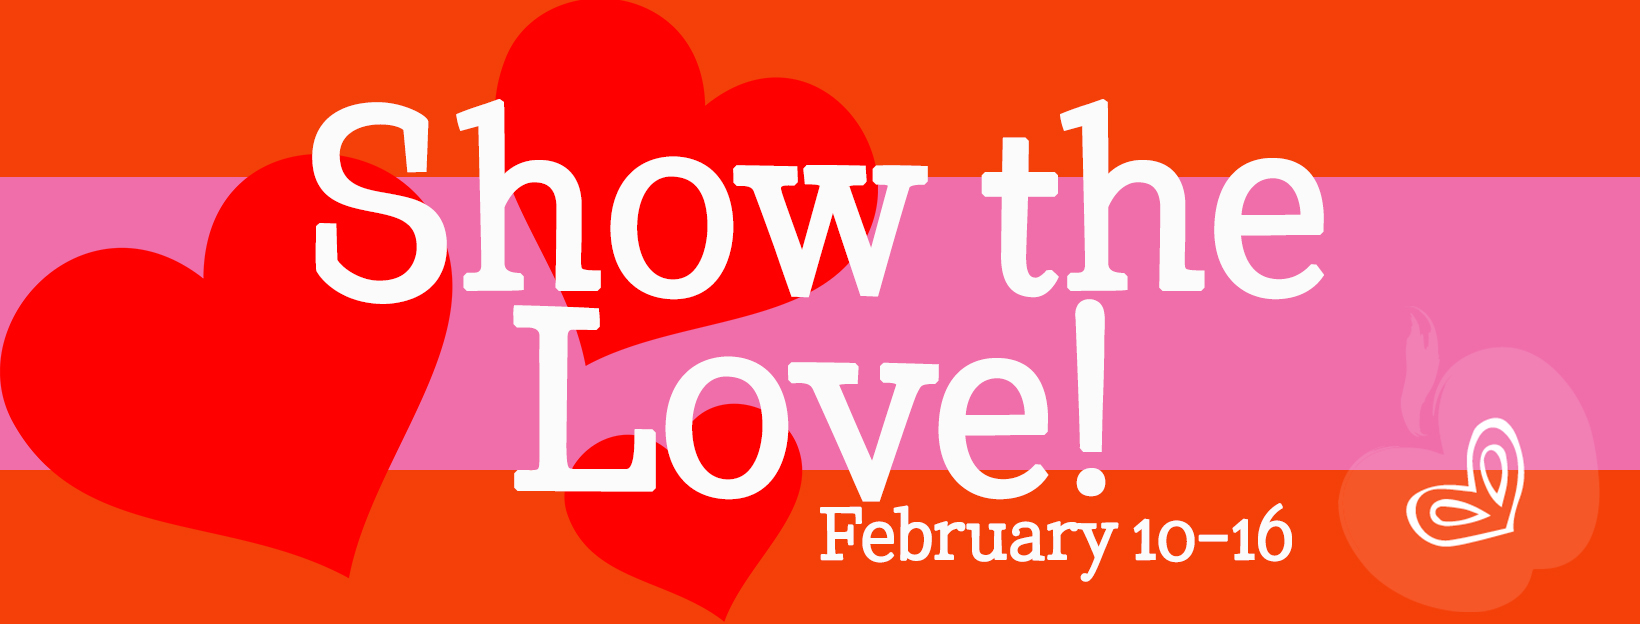 show the love banner.jpg